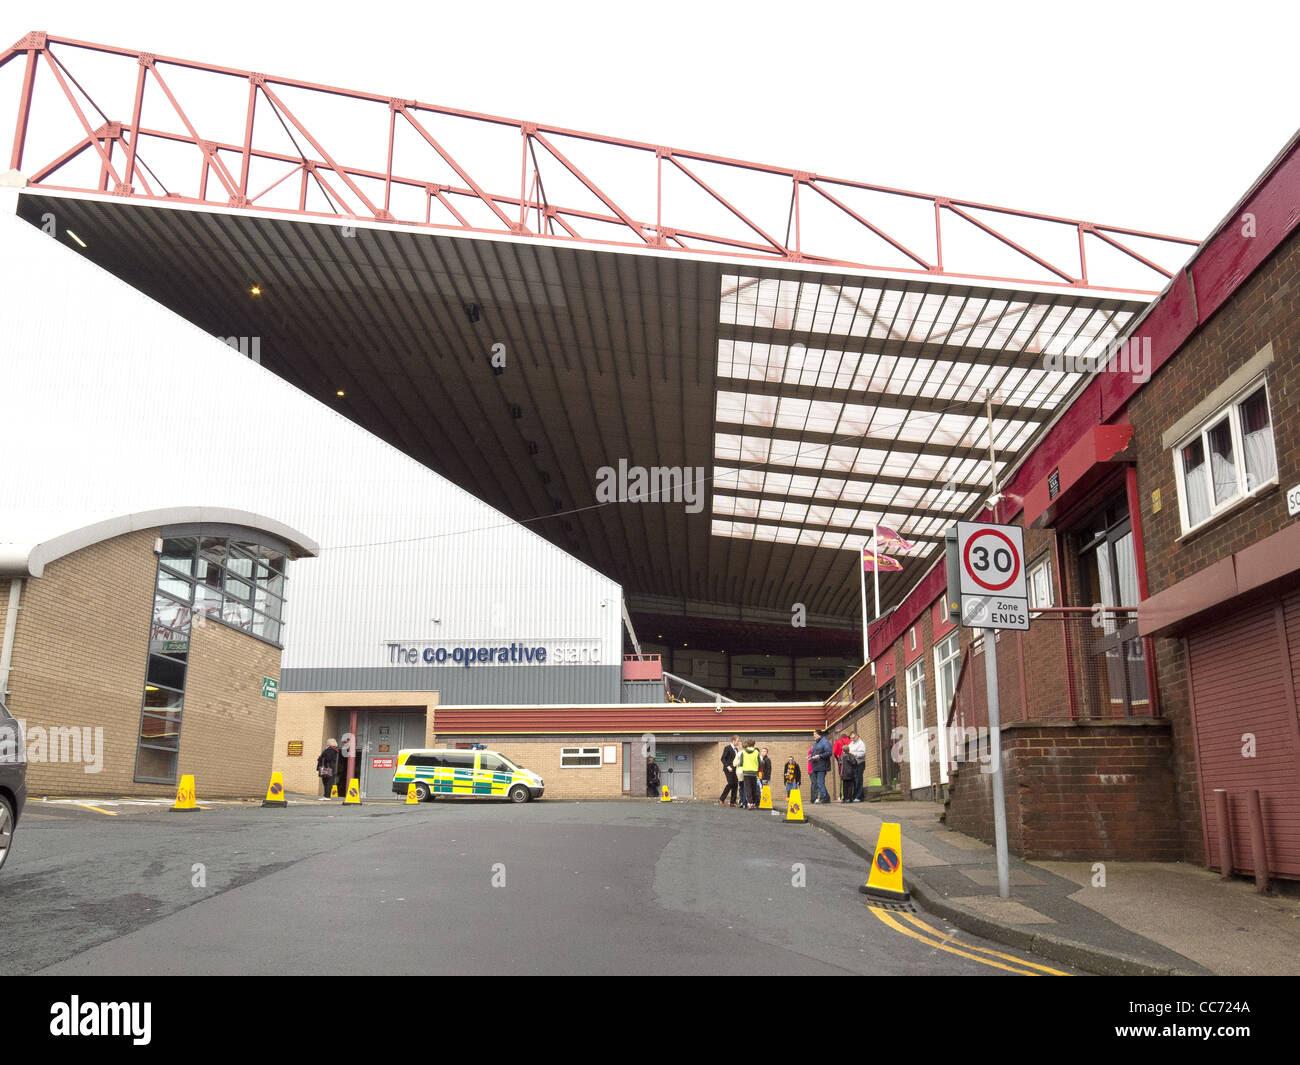 Bradford City Football Club - Bradford Stock Photo ...